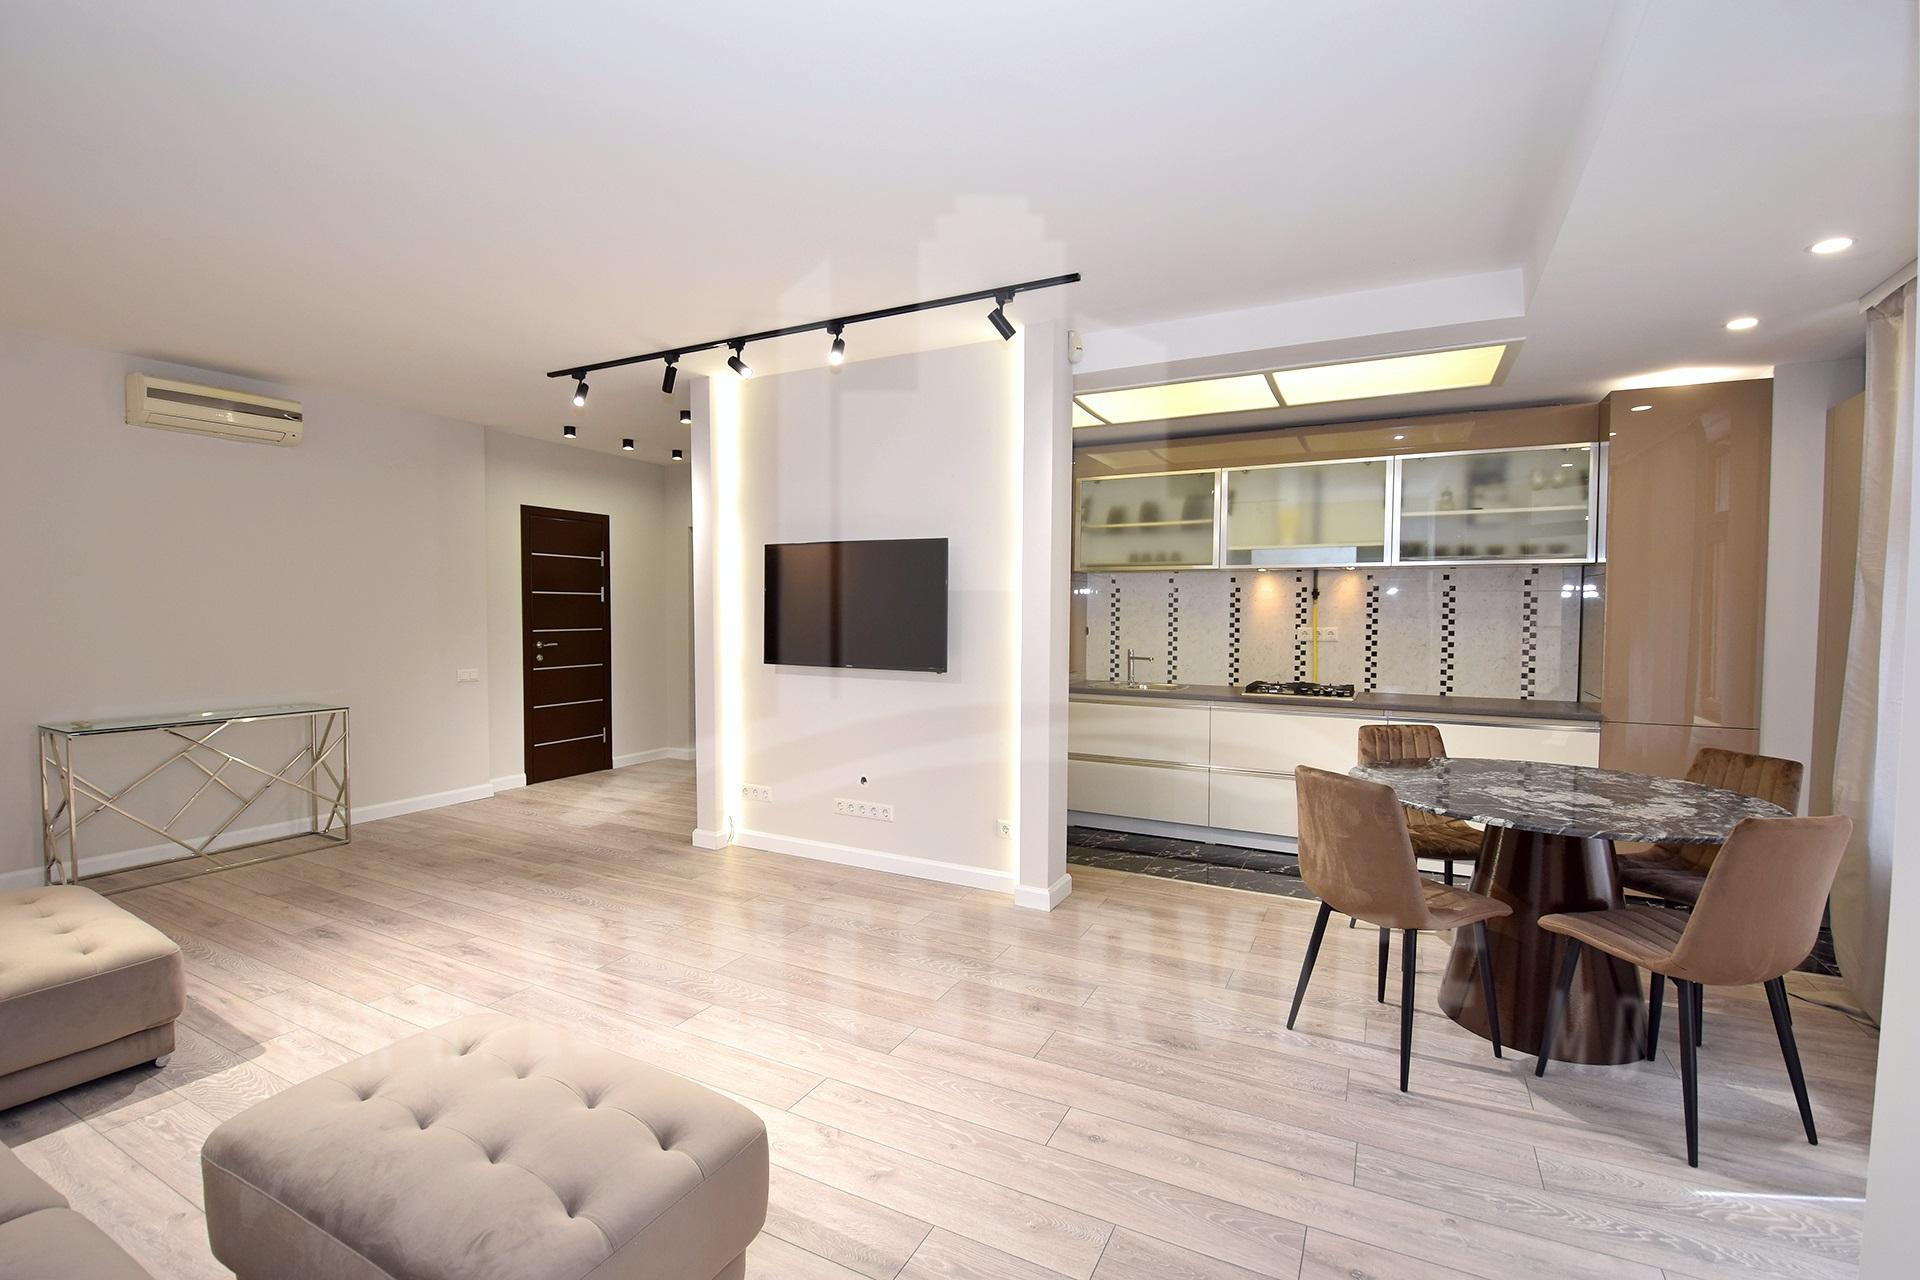 291_apartment_12.JPG